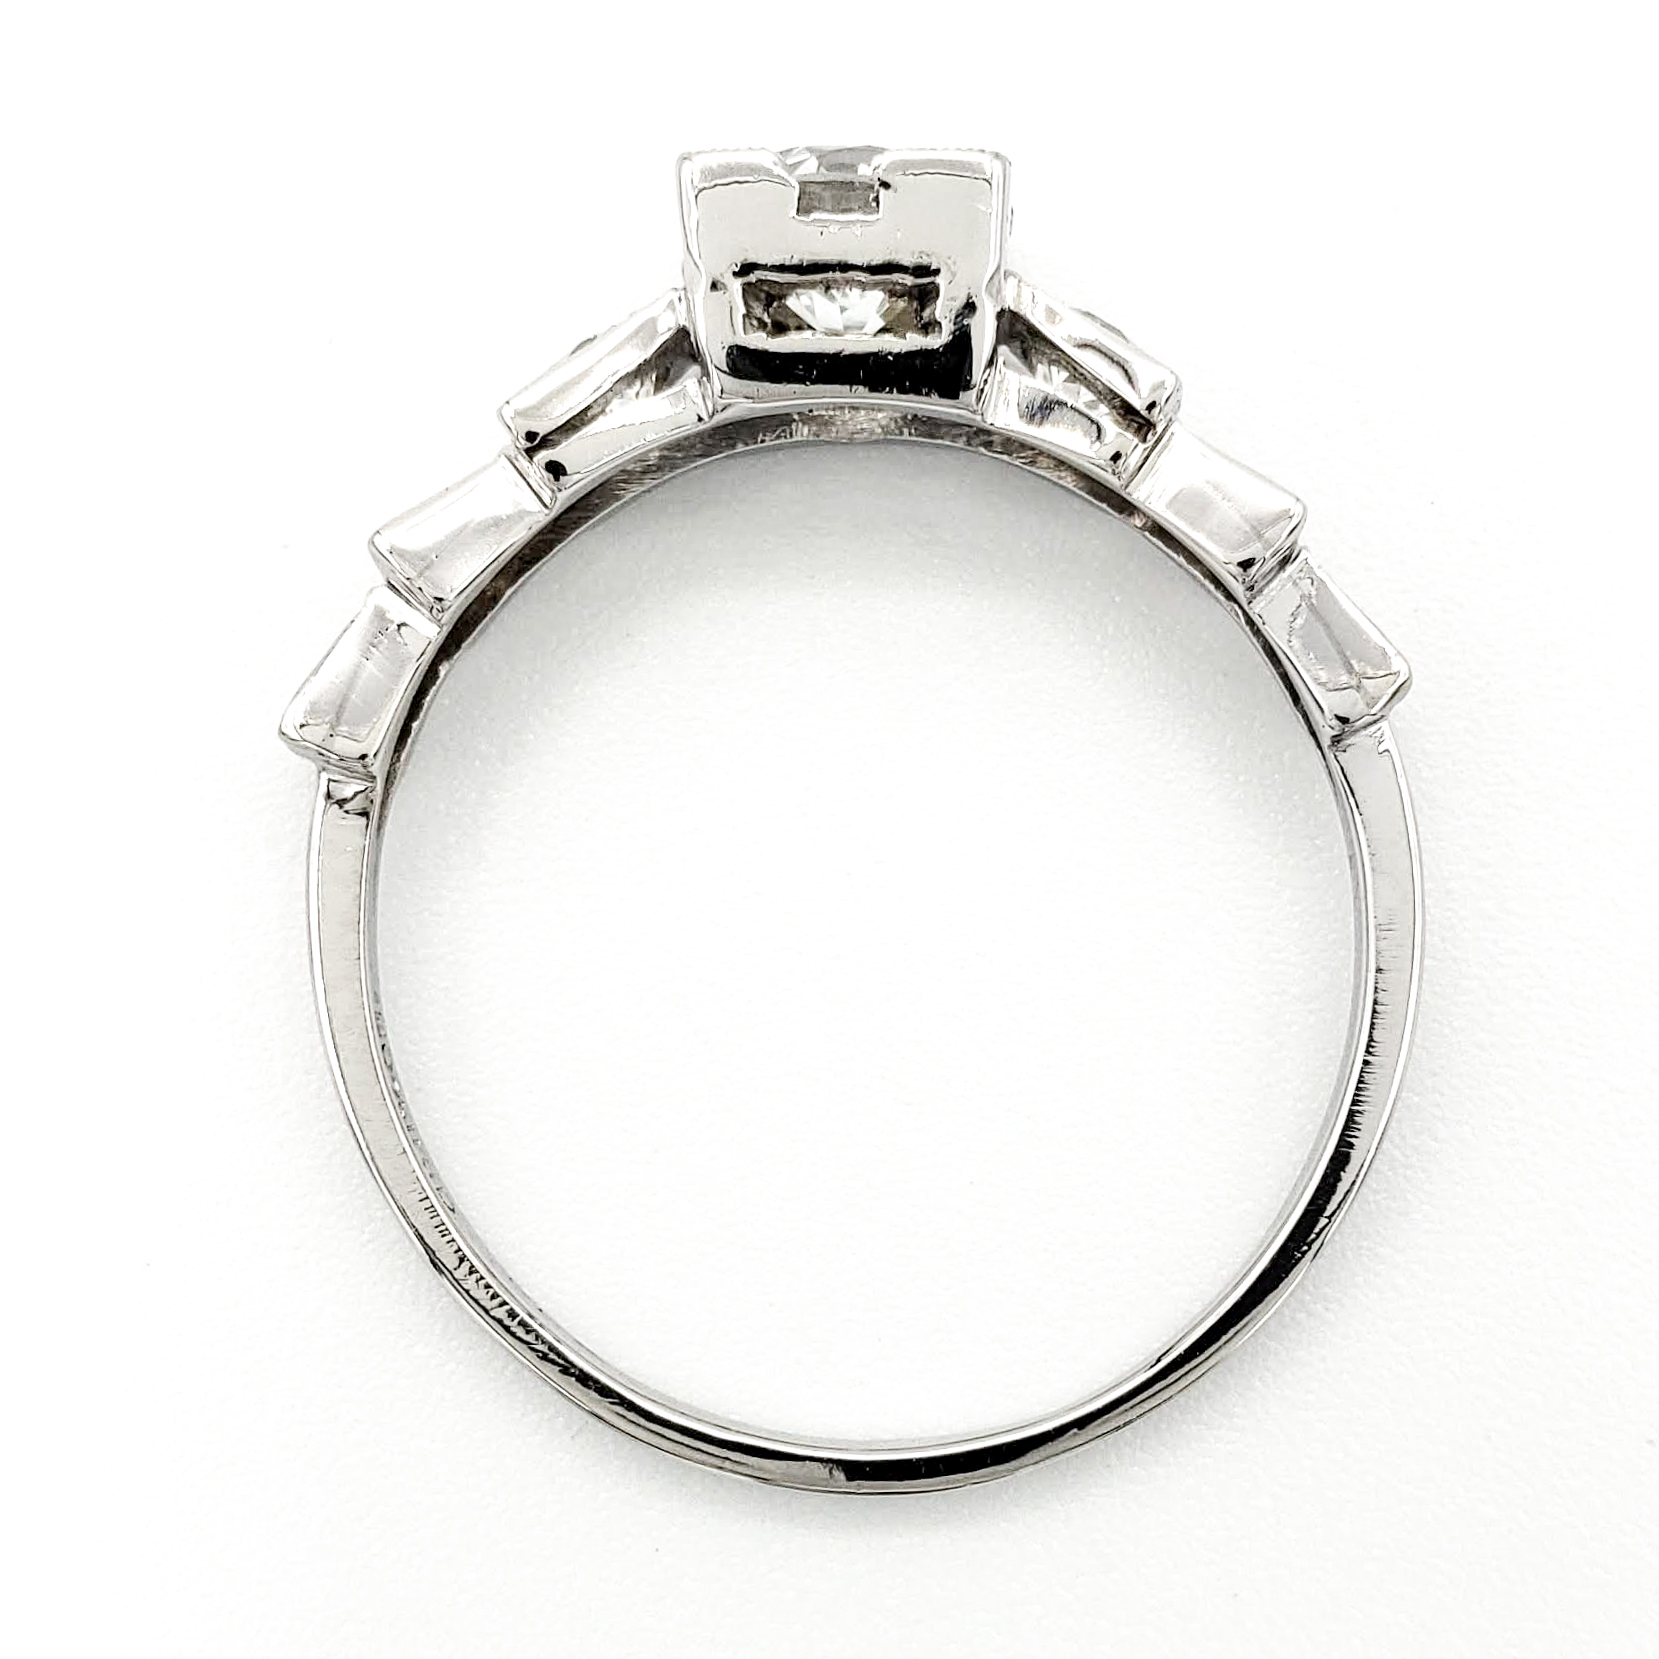 vintage-platinum-engagement-ring-with-0-70-carat-transitional-cut-diamond-gia-g-vvs2